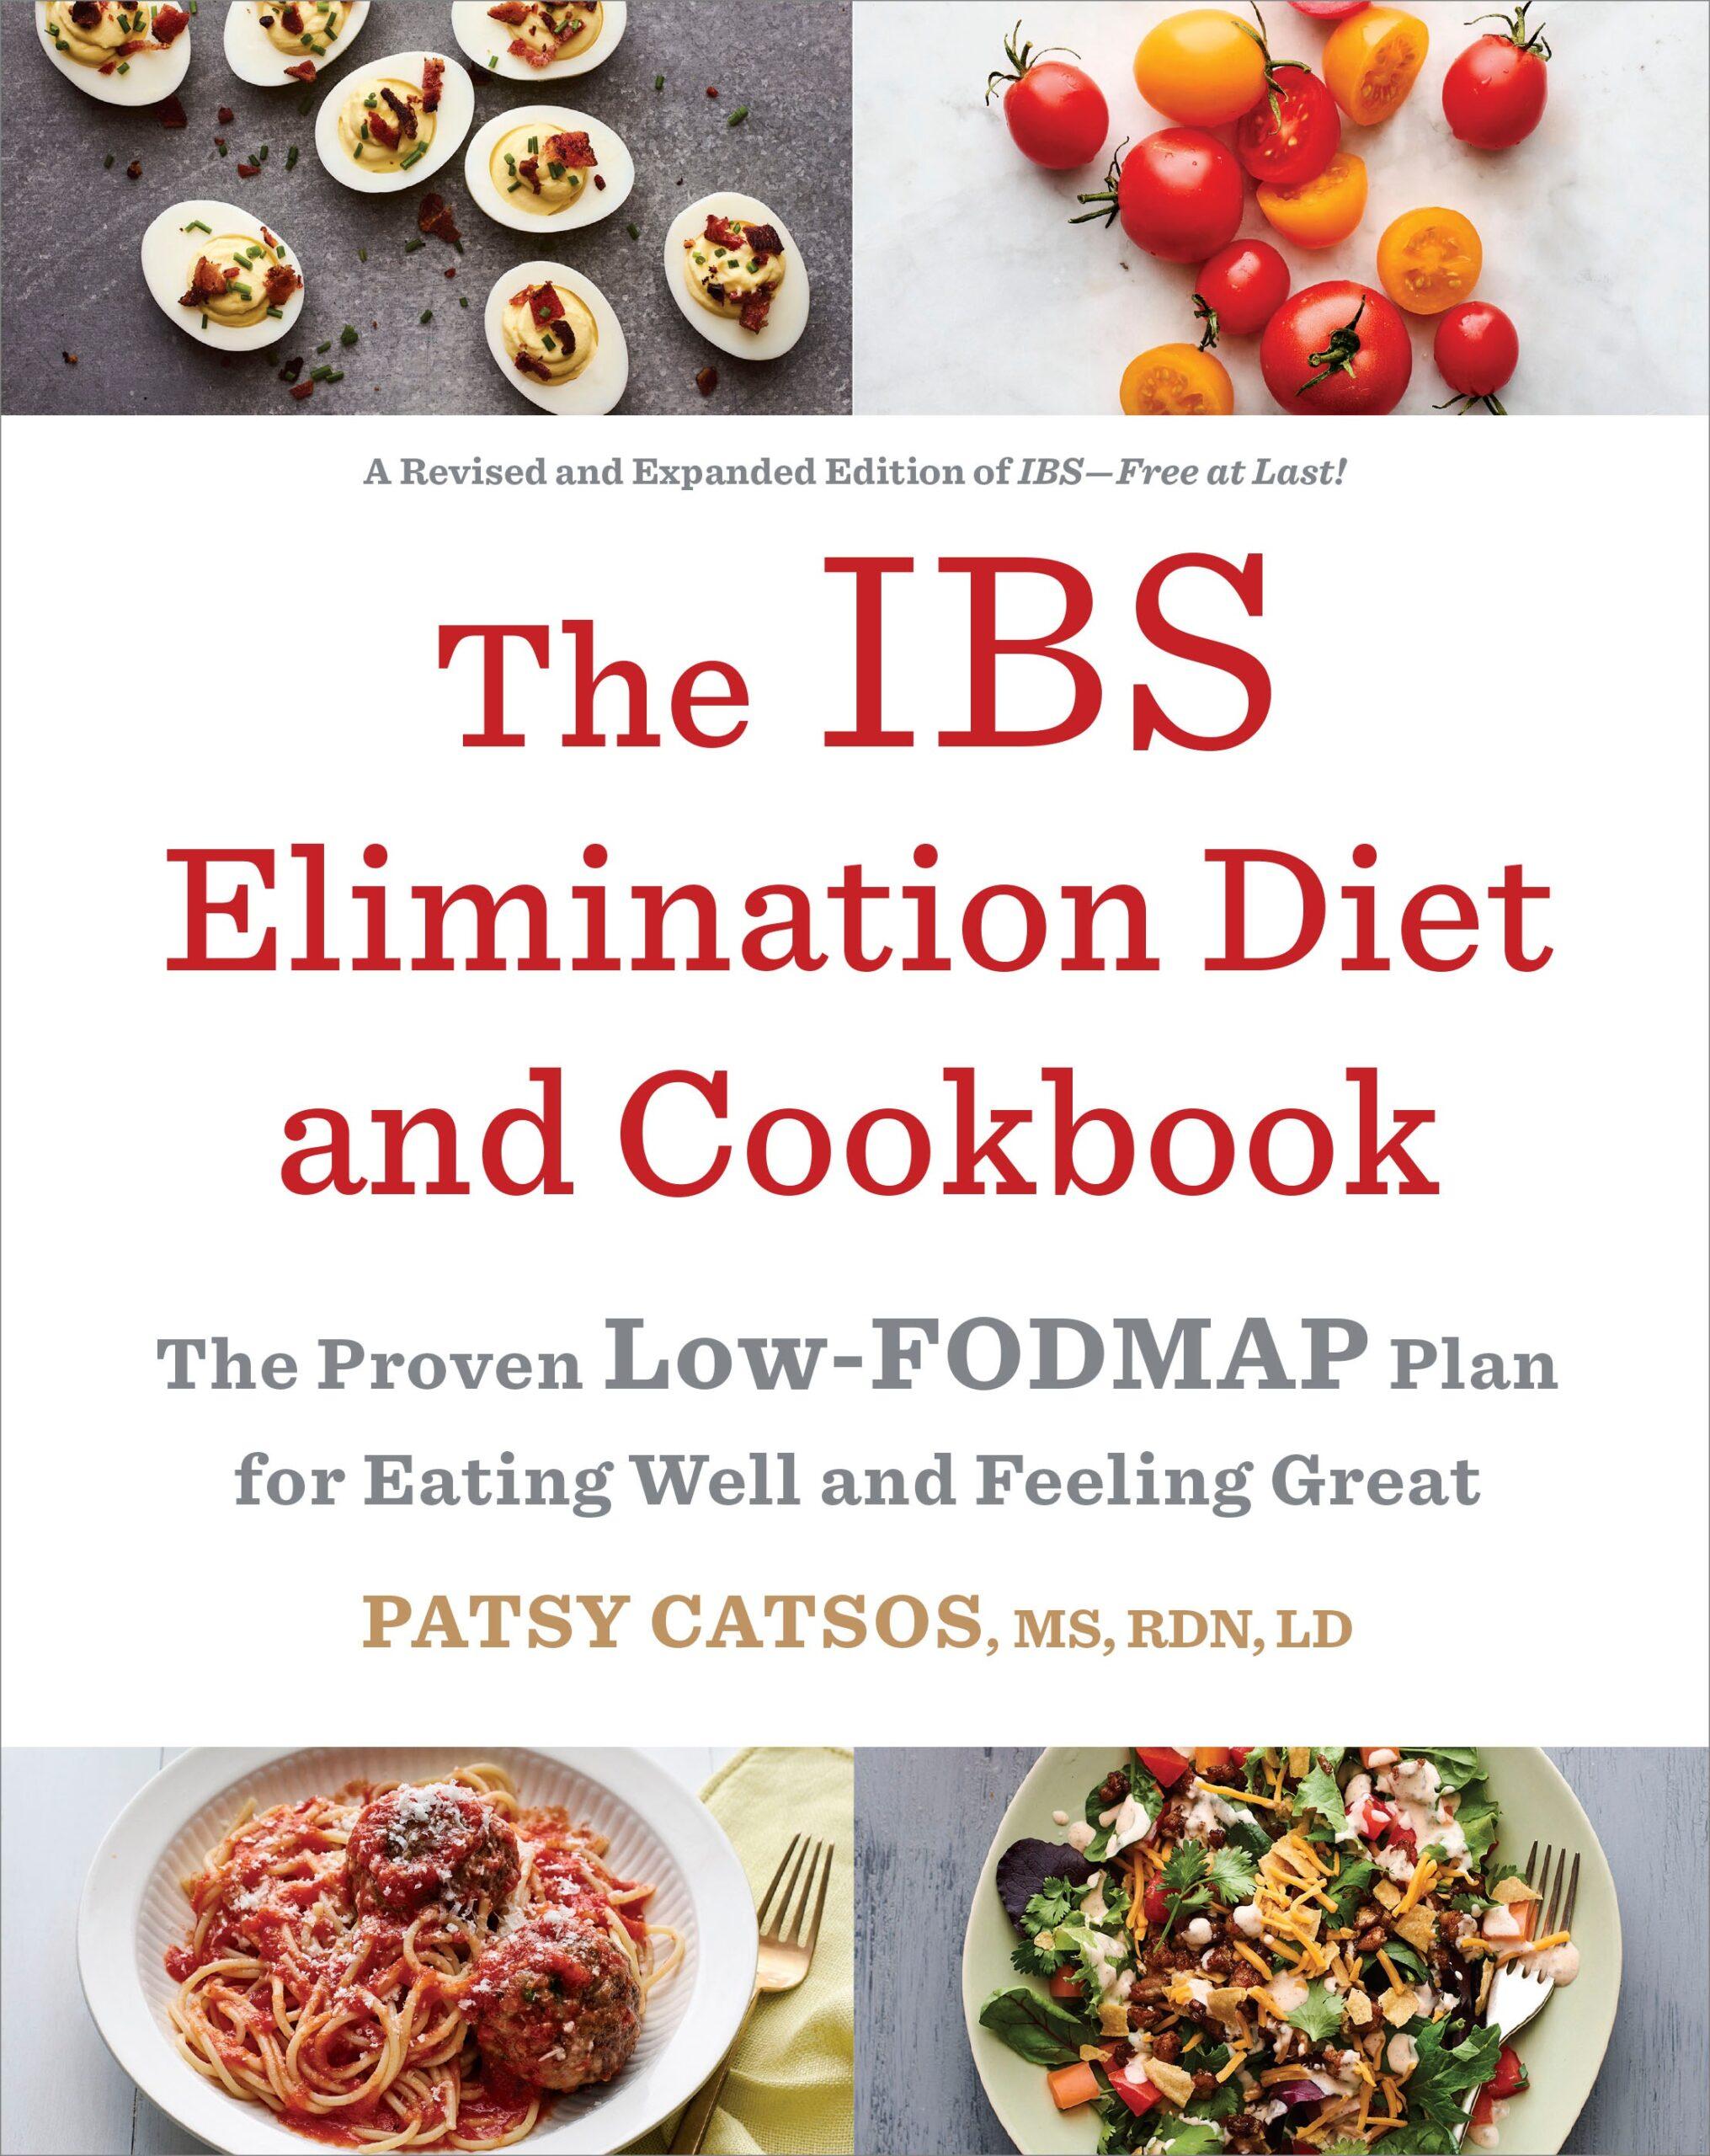 ibs elimination diet cookbook jacket image scaled